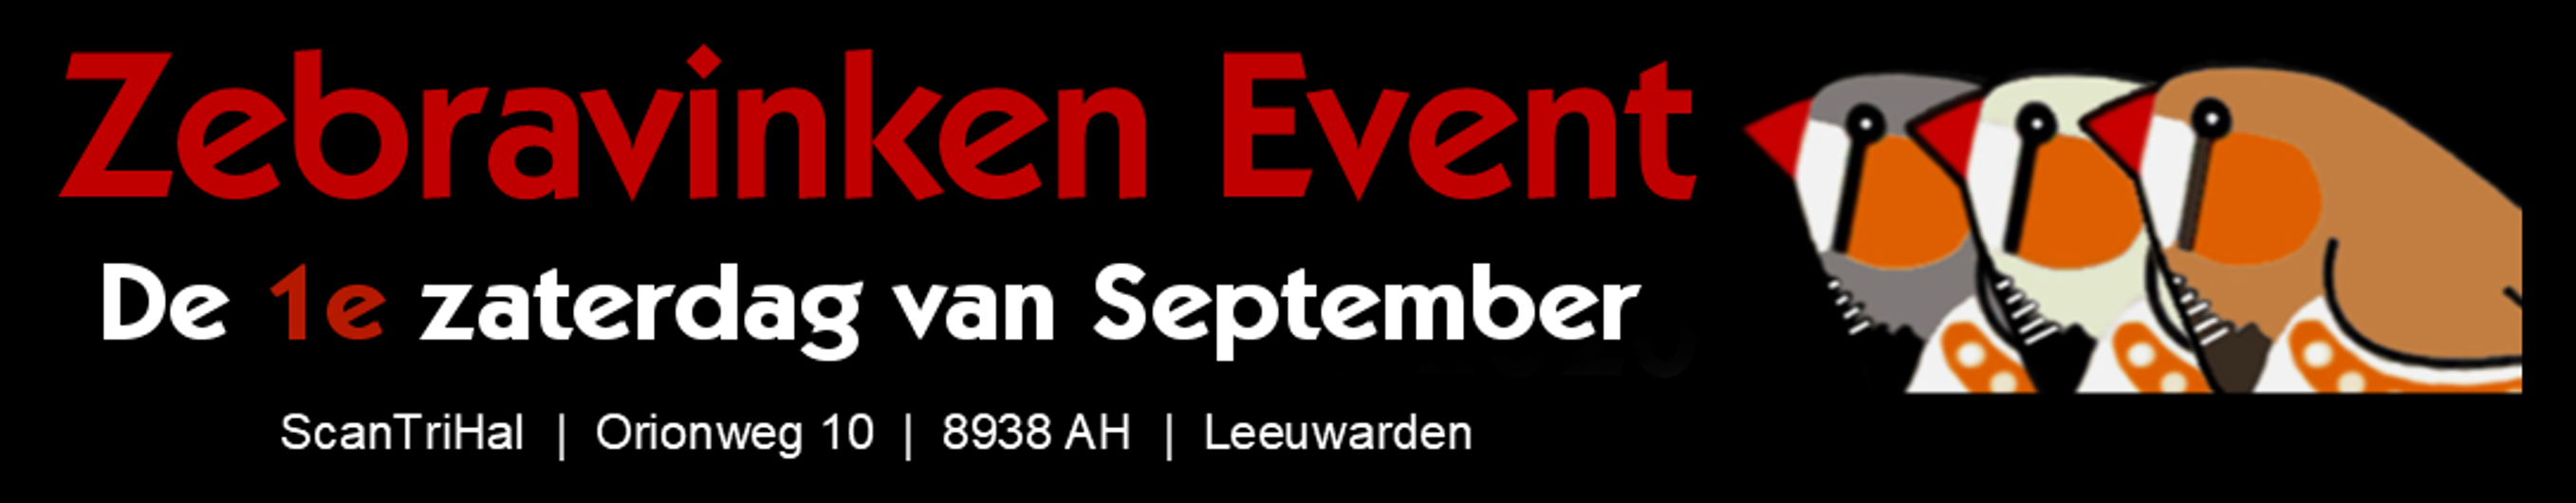 Zebravinken Event